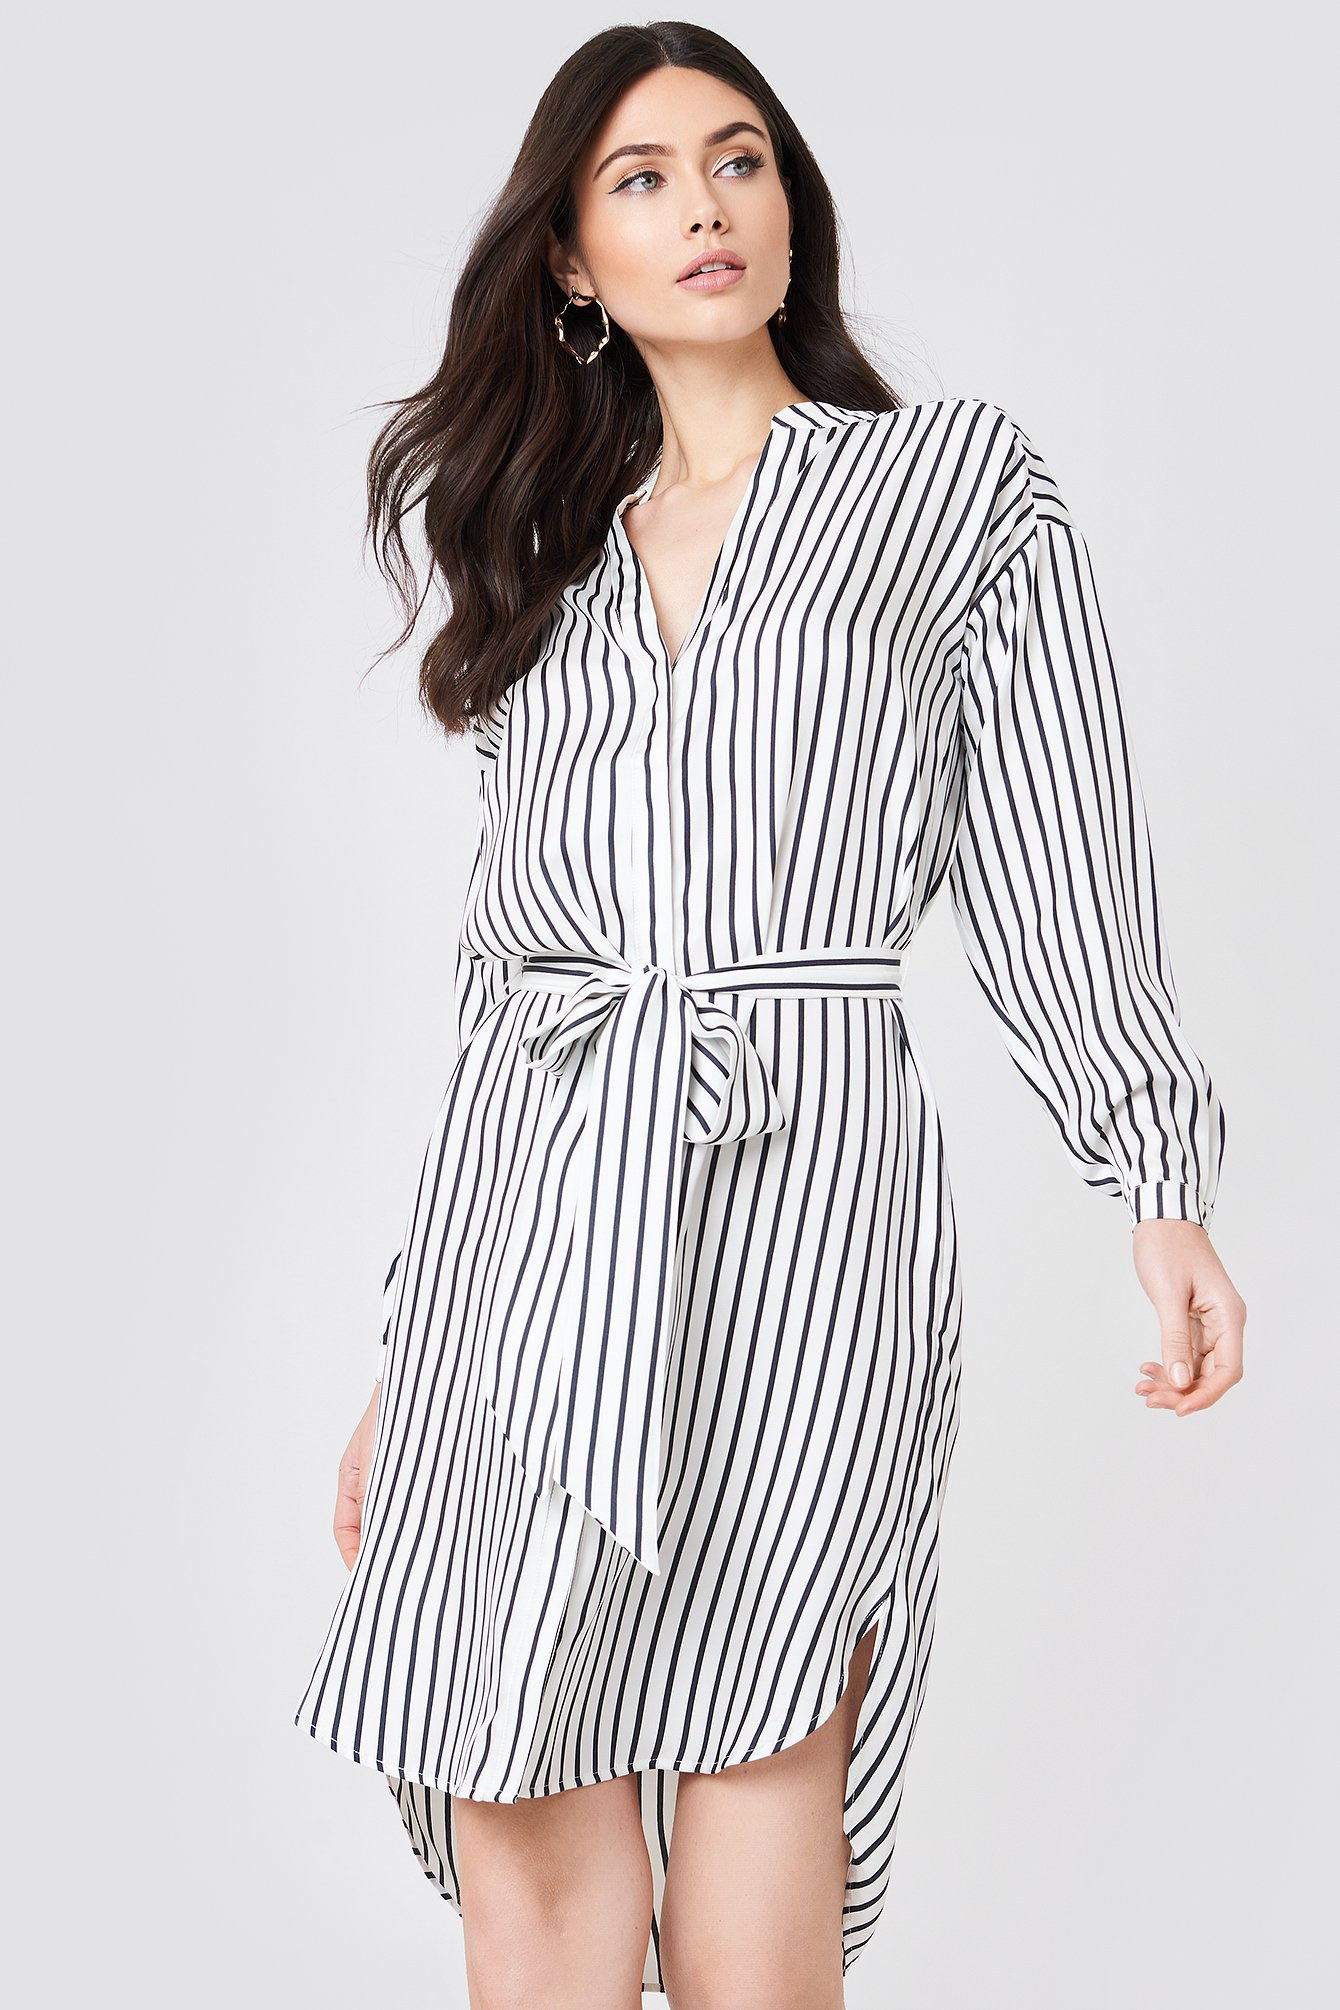 FWSS LISA DRESS - WHITE